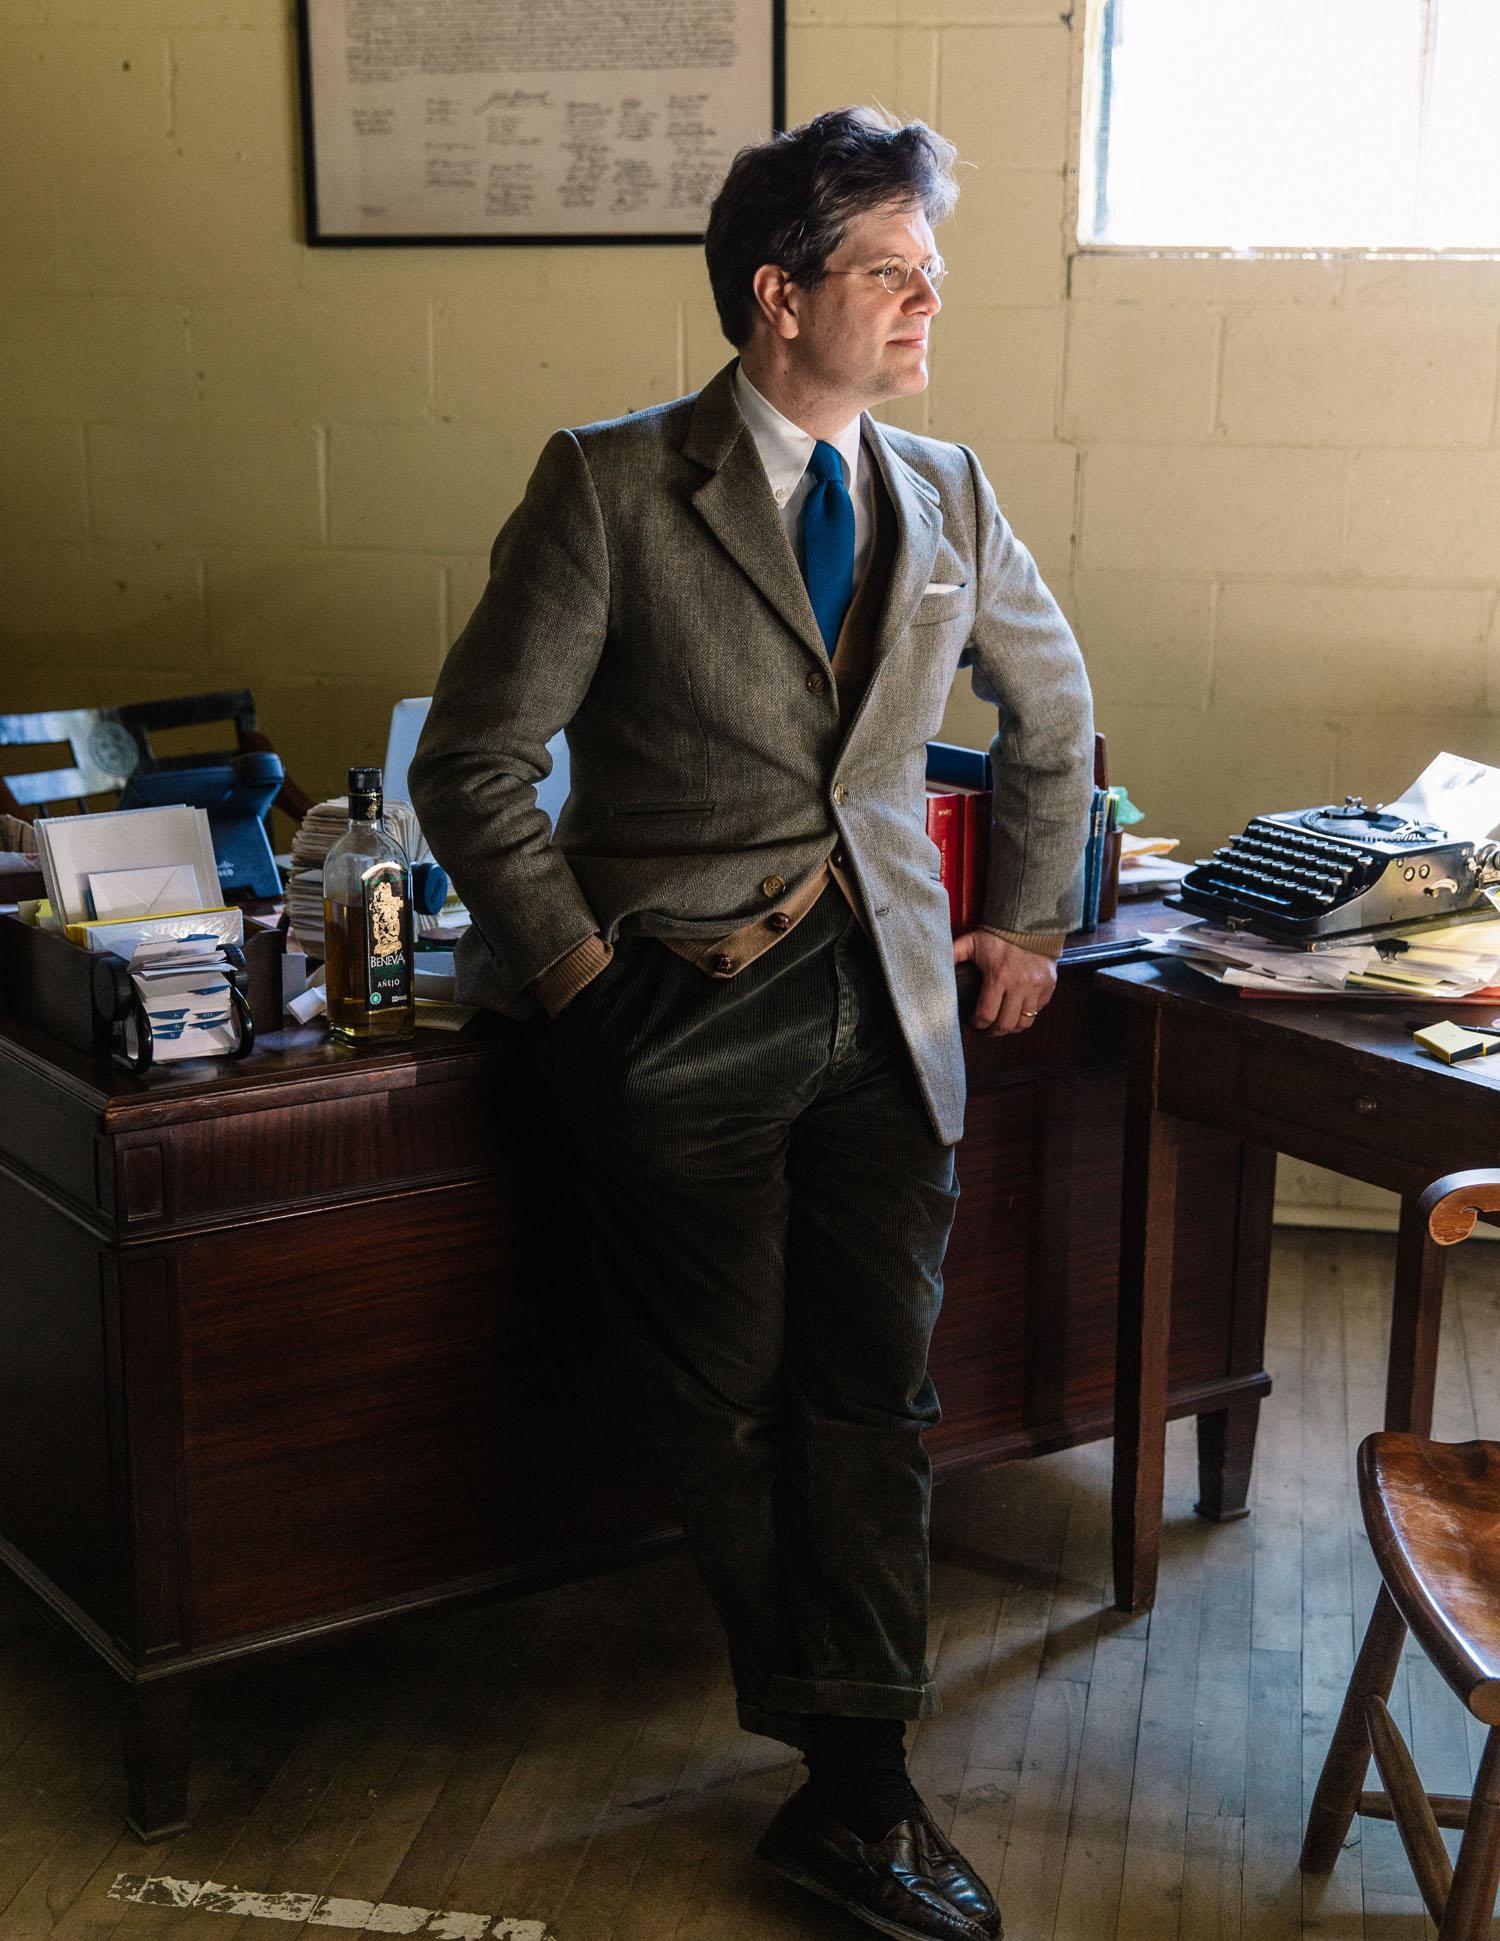 Luke Ives Pontifell in his office.